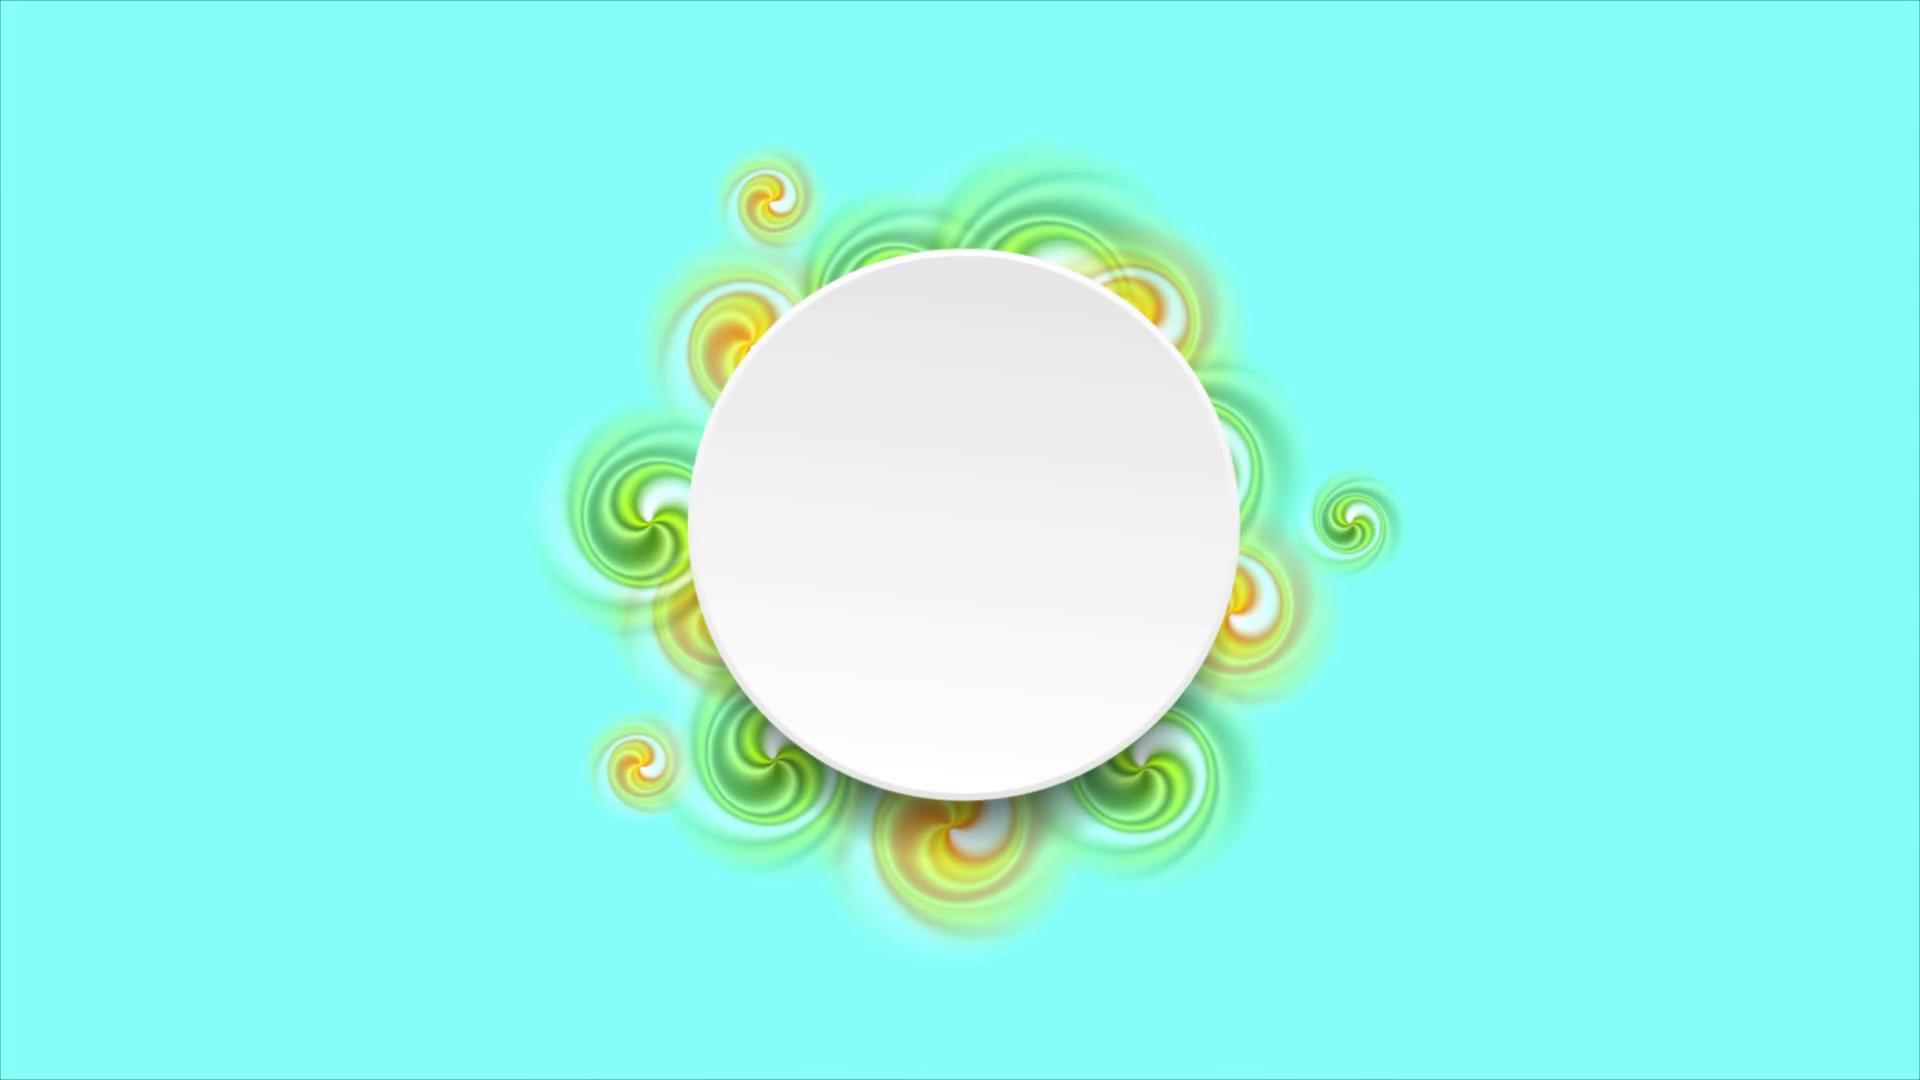 Circle Shape PNG HD - 142128